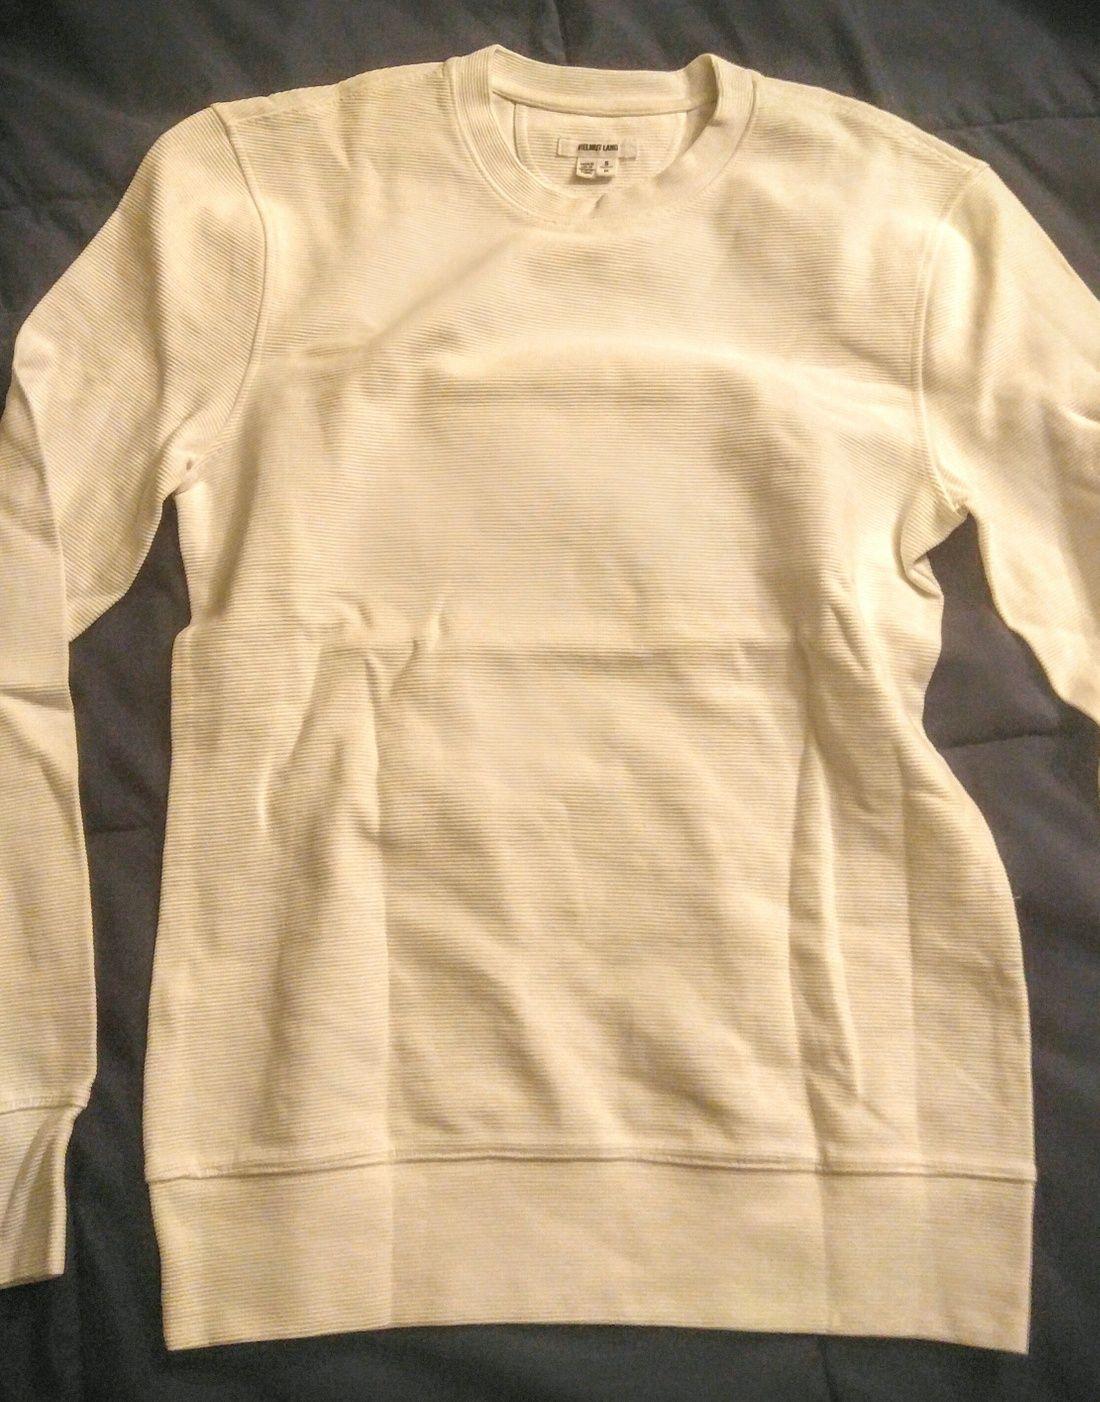 Helmut Lang Longsleeve Ribbed Tshirt Size S $90 - Grailed